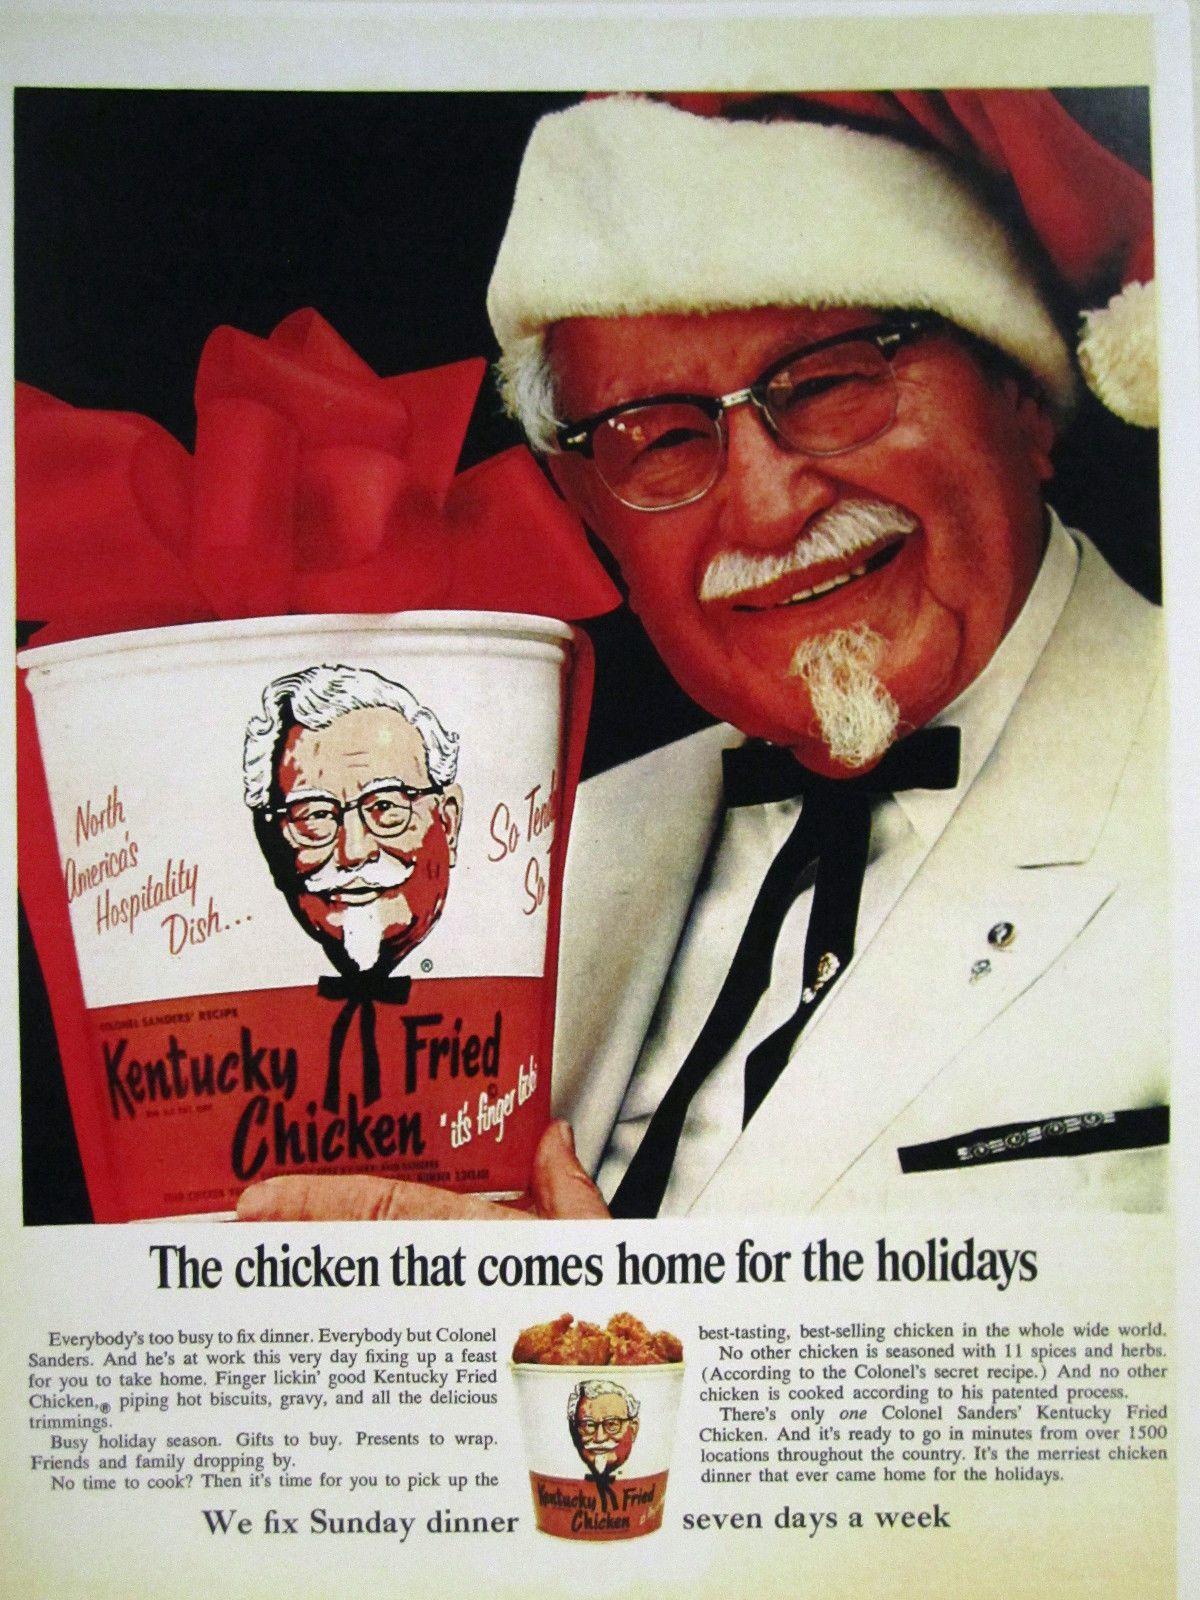 Kfc Christmas 2020 Col Sanders Vintage 1960's Advertising Store Sign Ad Christmas KFC COLONEL